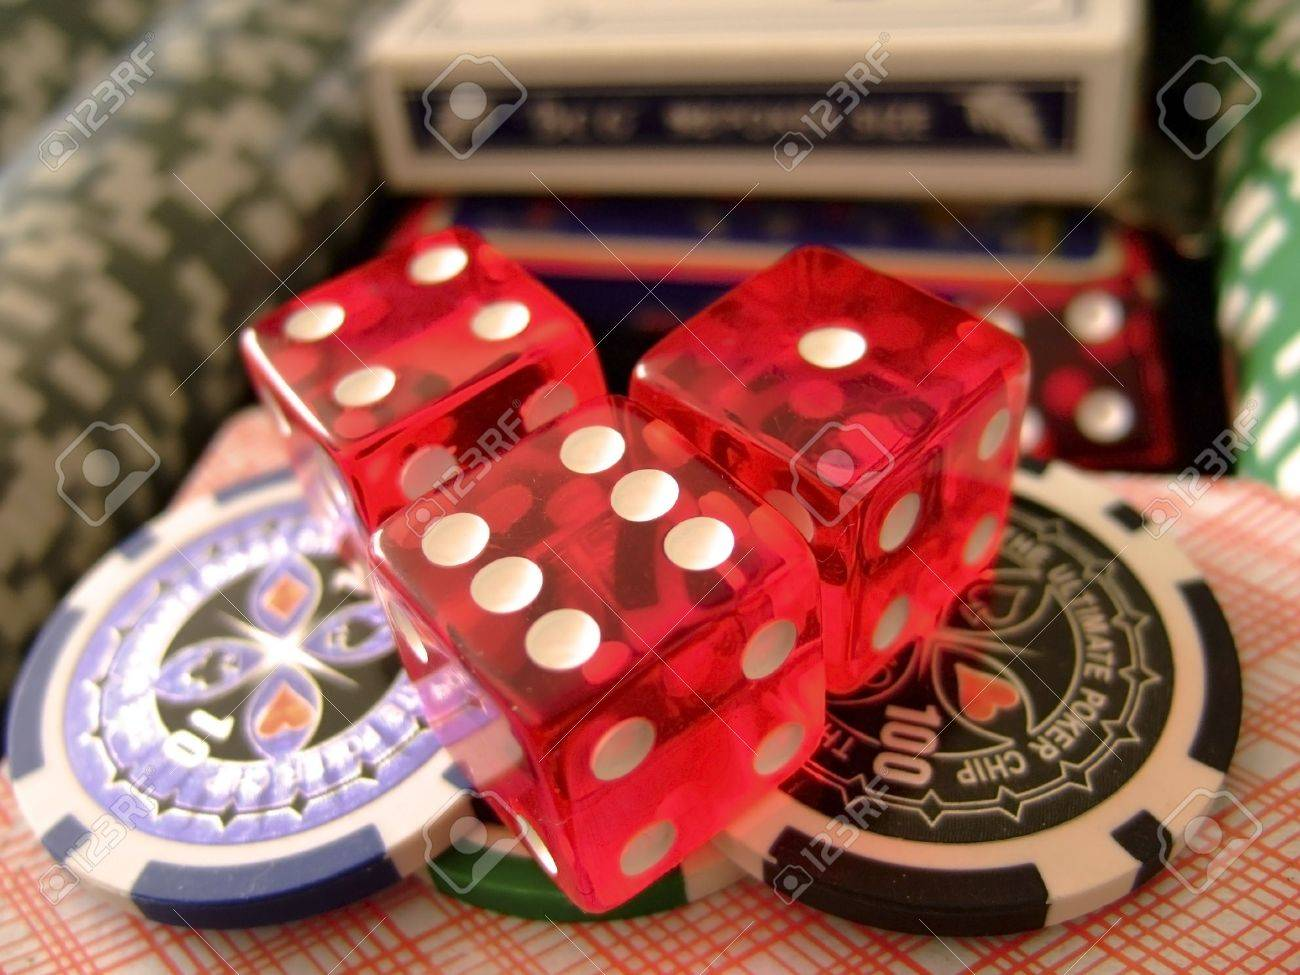 Casino stuff arguements against gambling